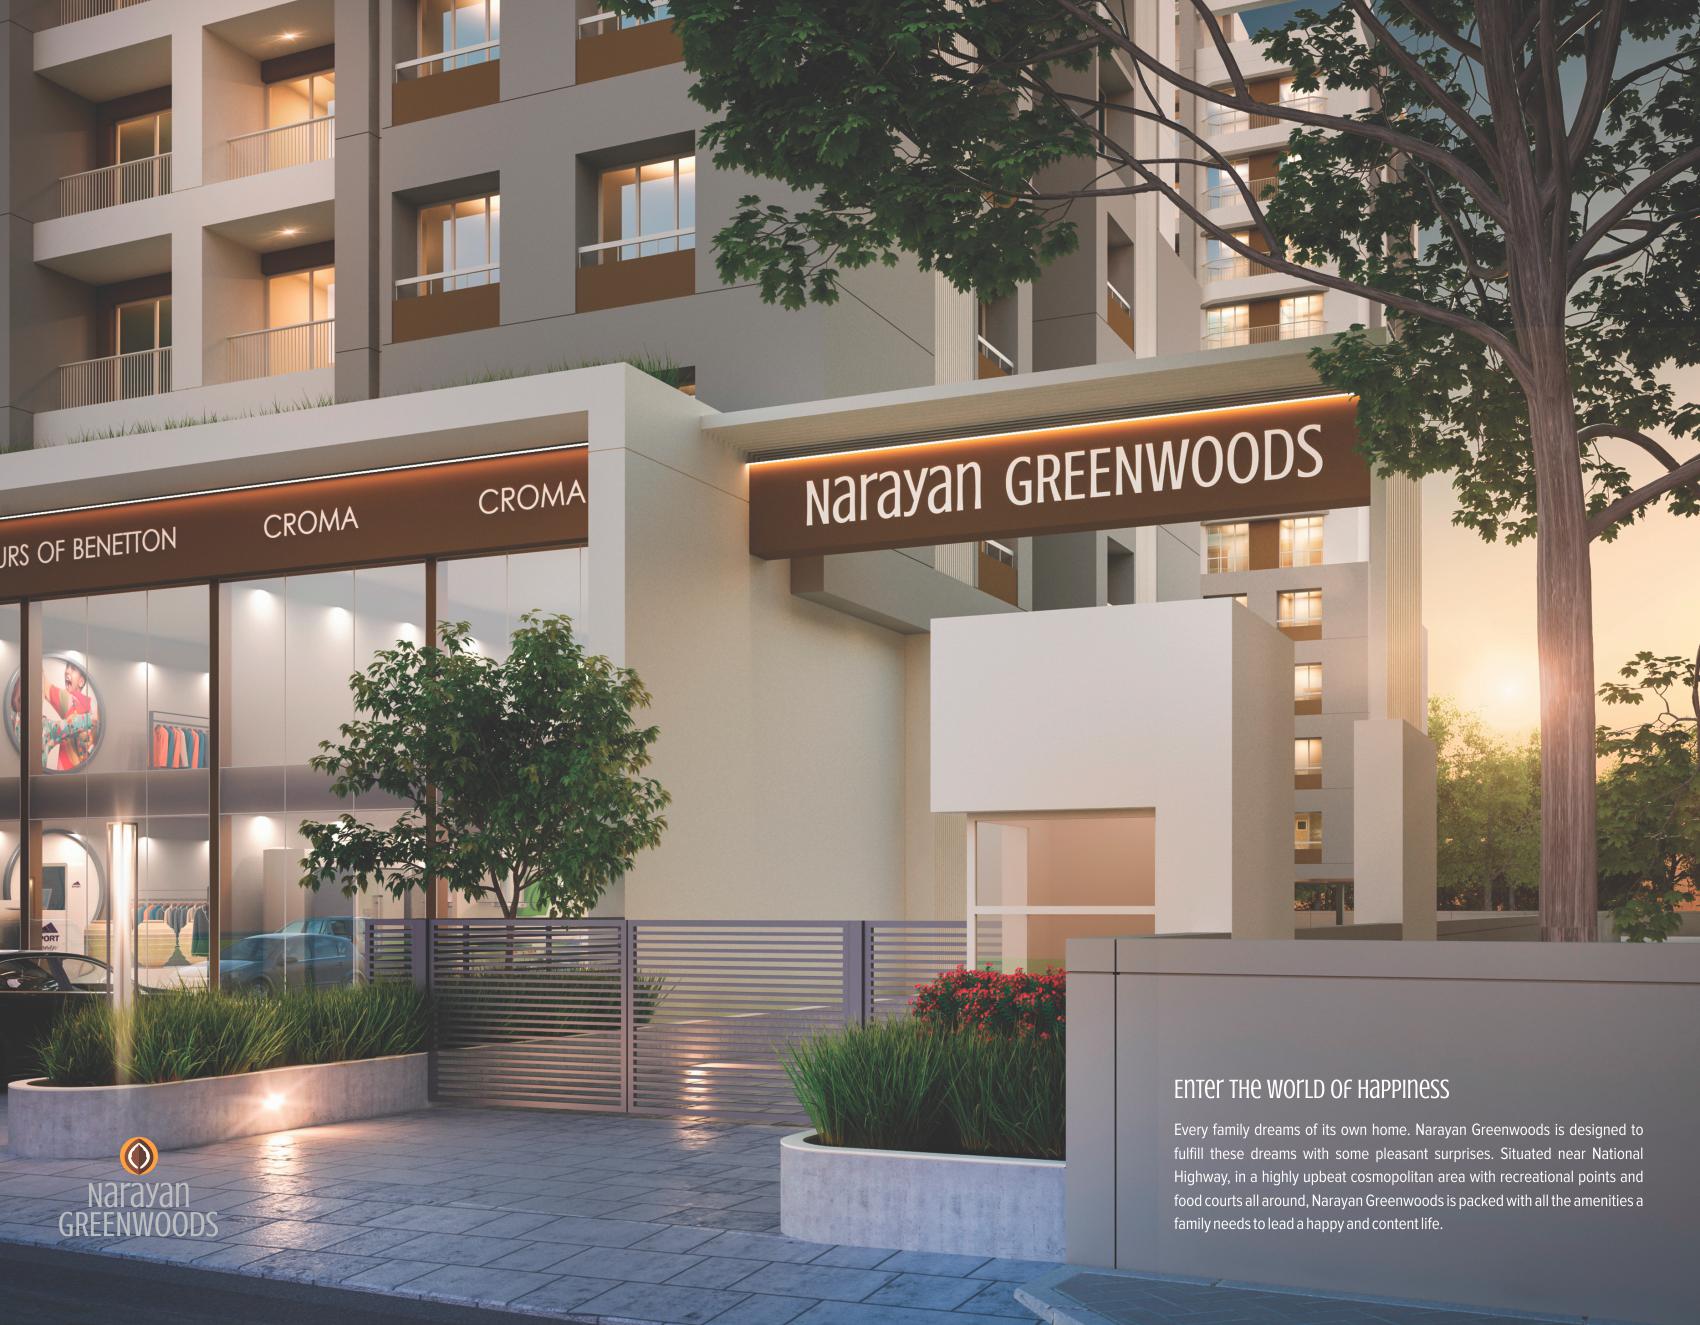 Narayan Greenwoods Entrance